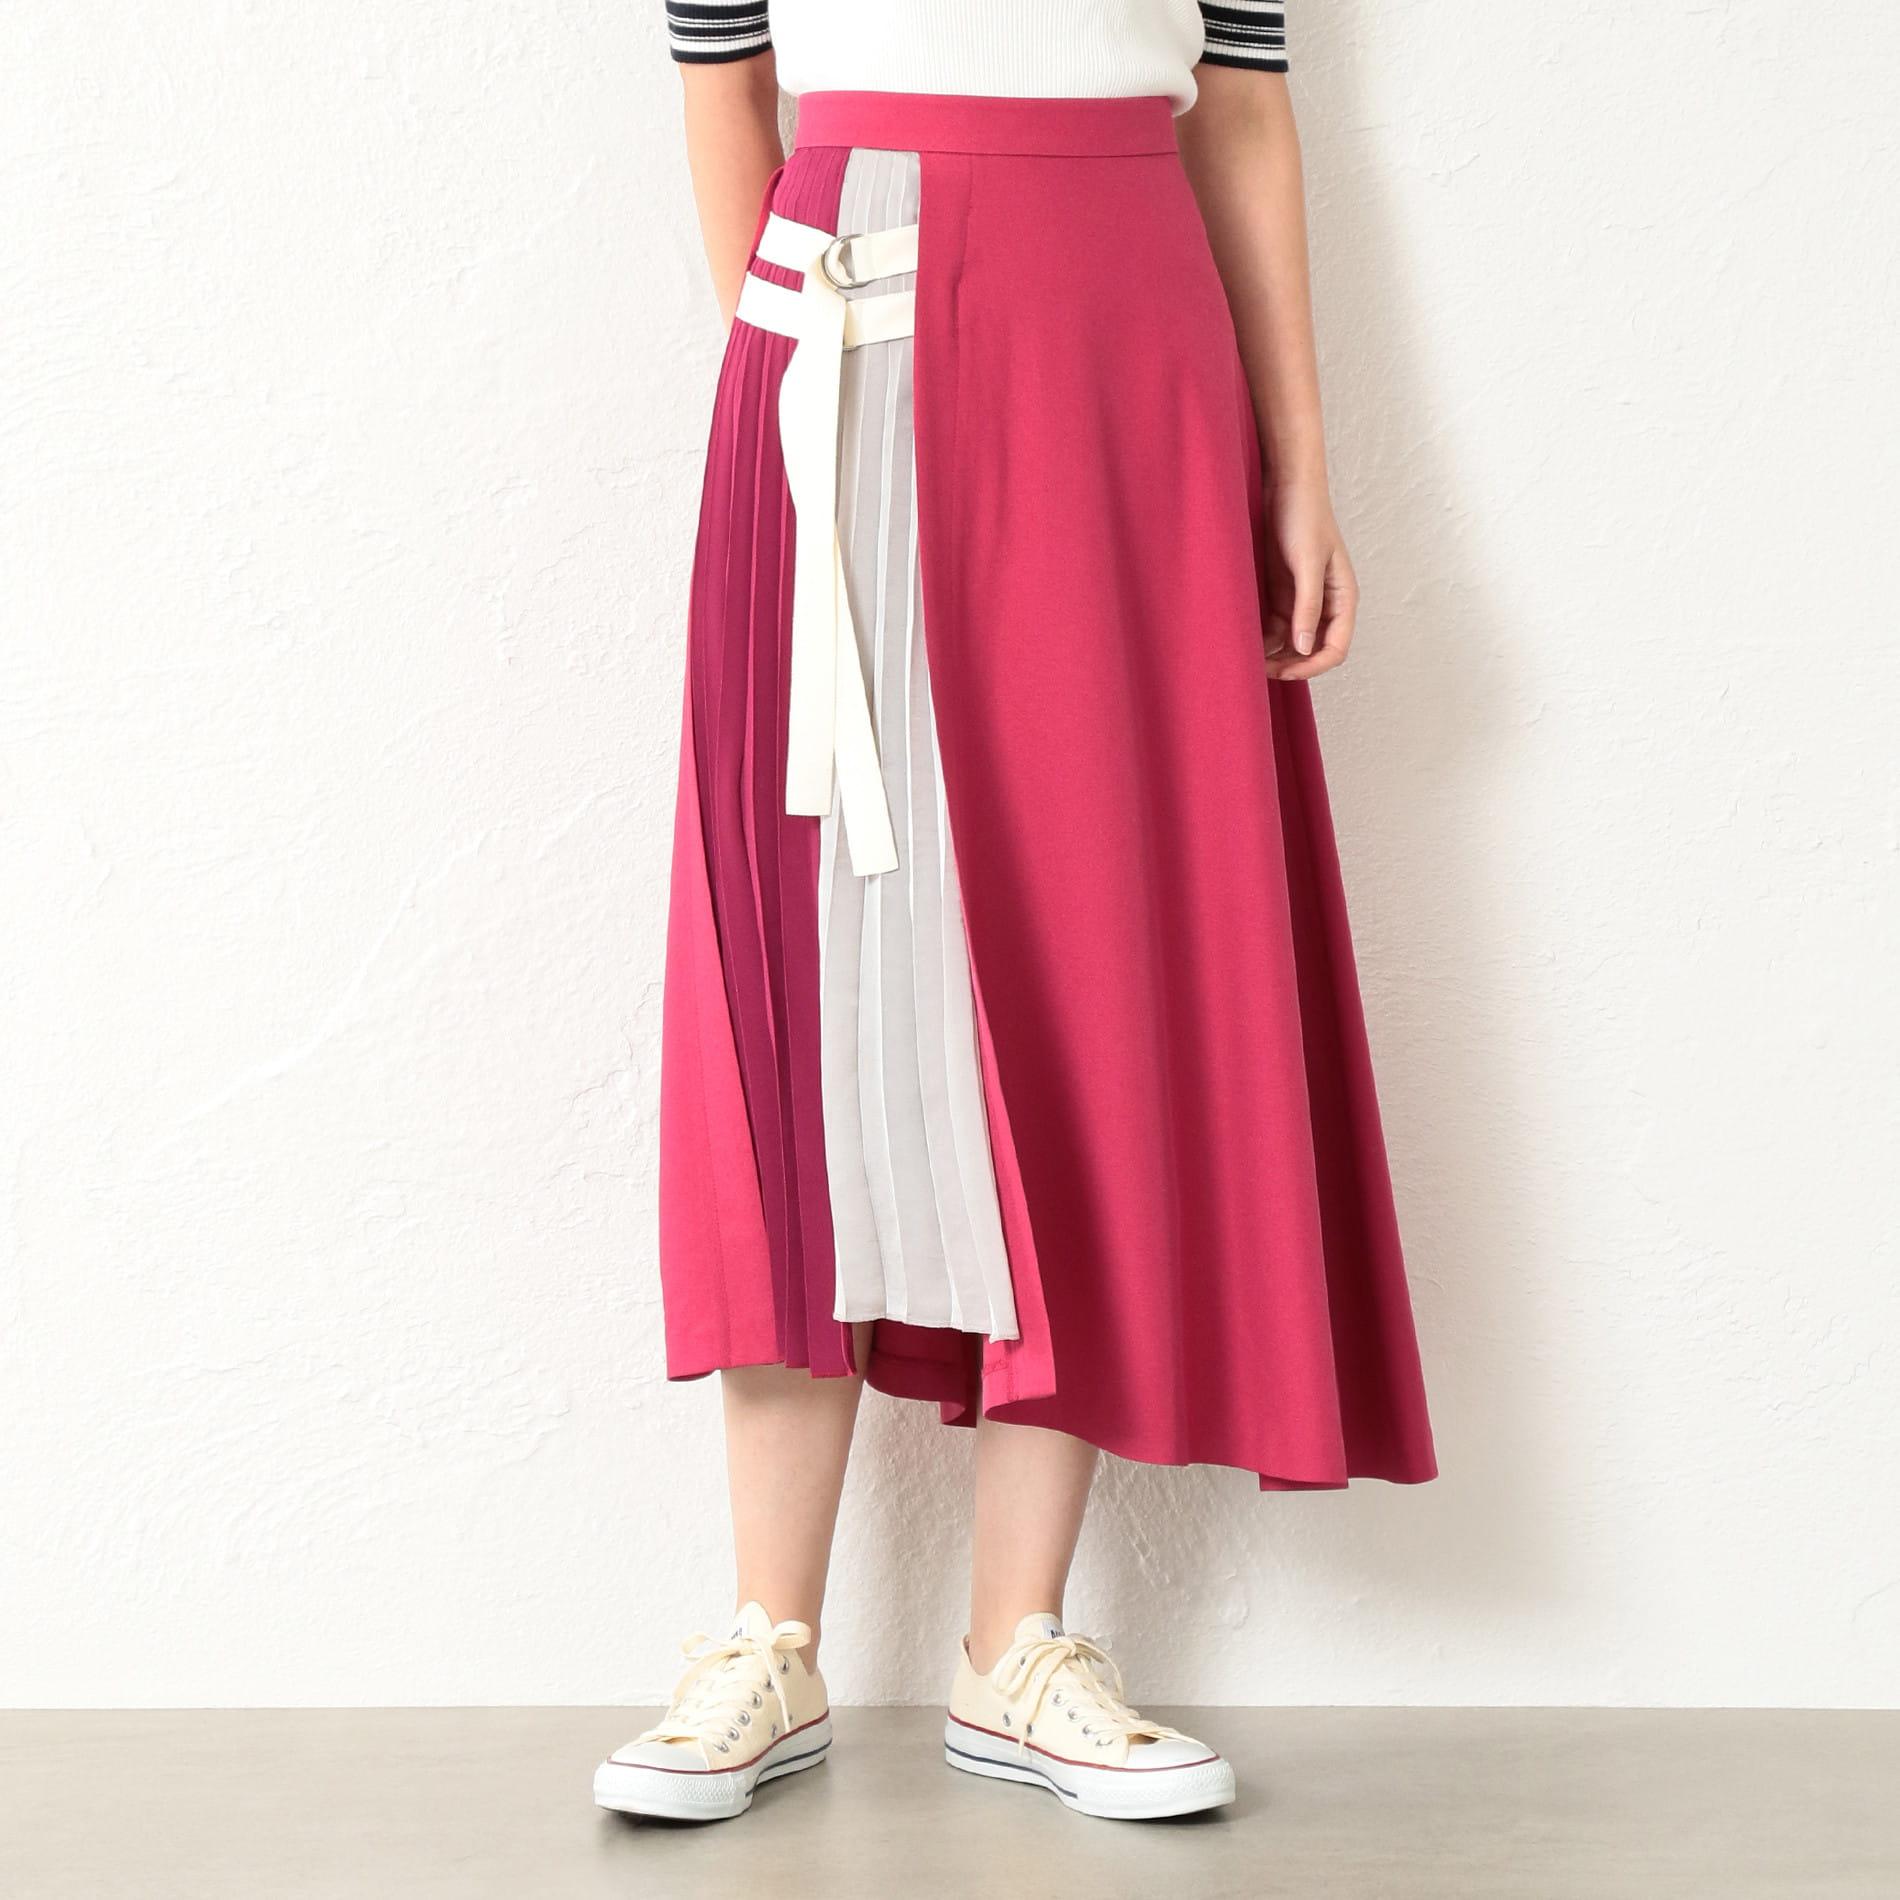 【GUILD PRIME】WOMEN カラーブロックベルテッドスカート